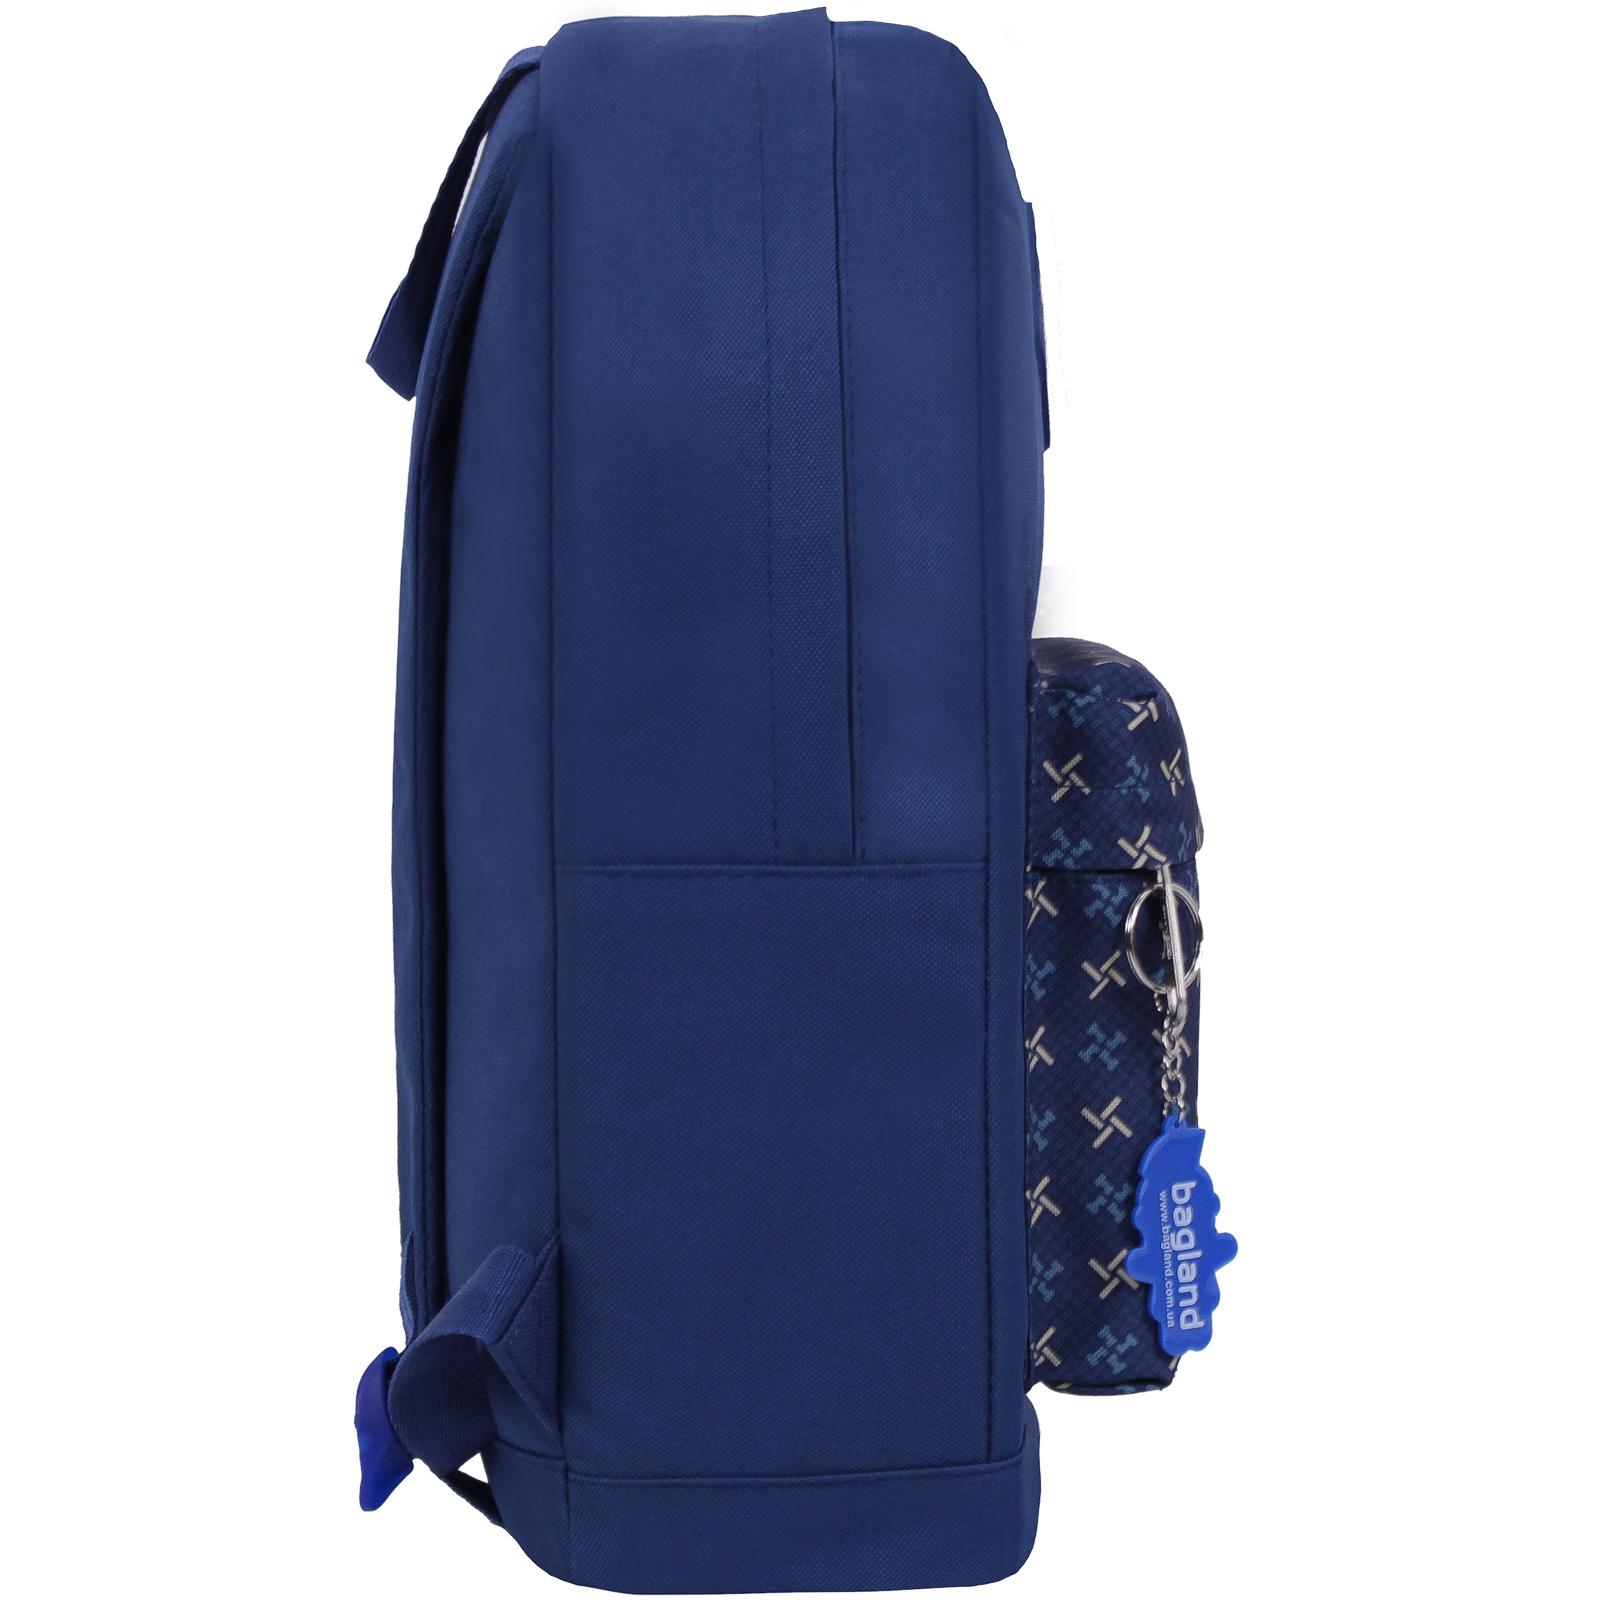 Рюкзак Bagland Молодежный W/R 17 л. Синий 463 (00533662) фото 2